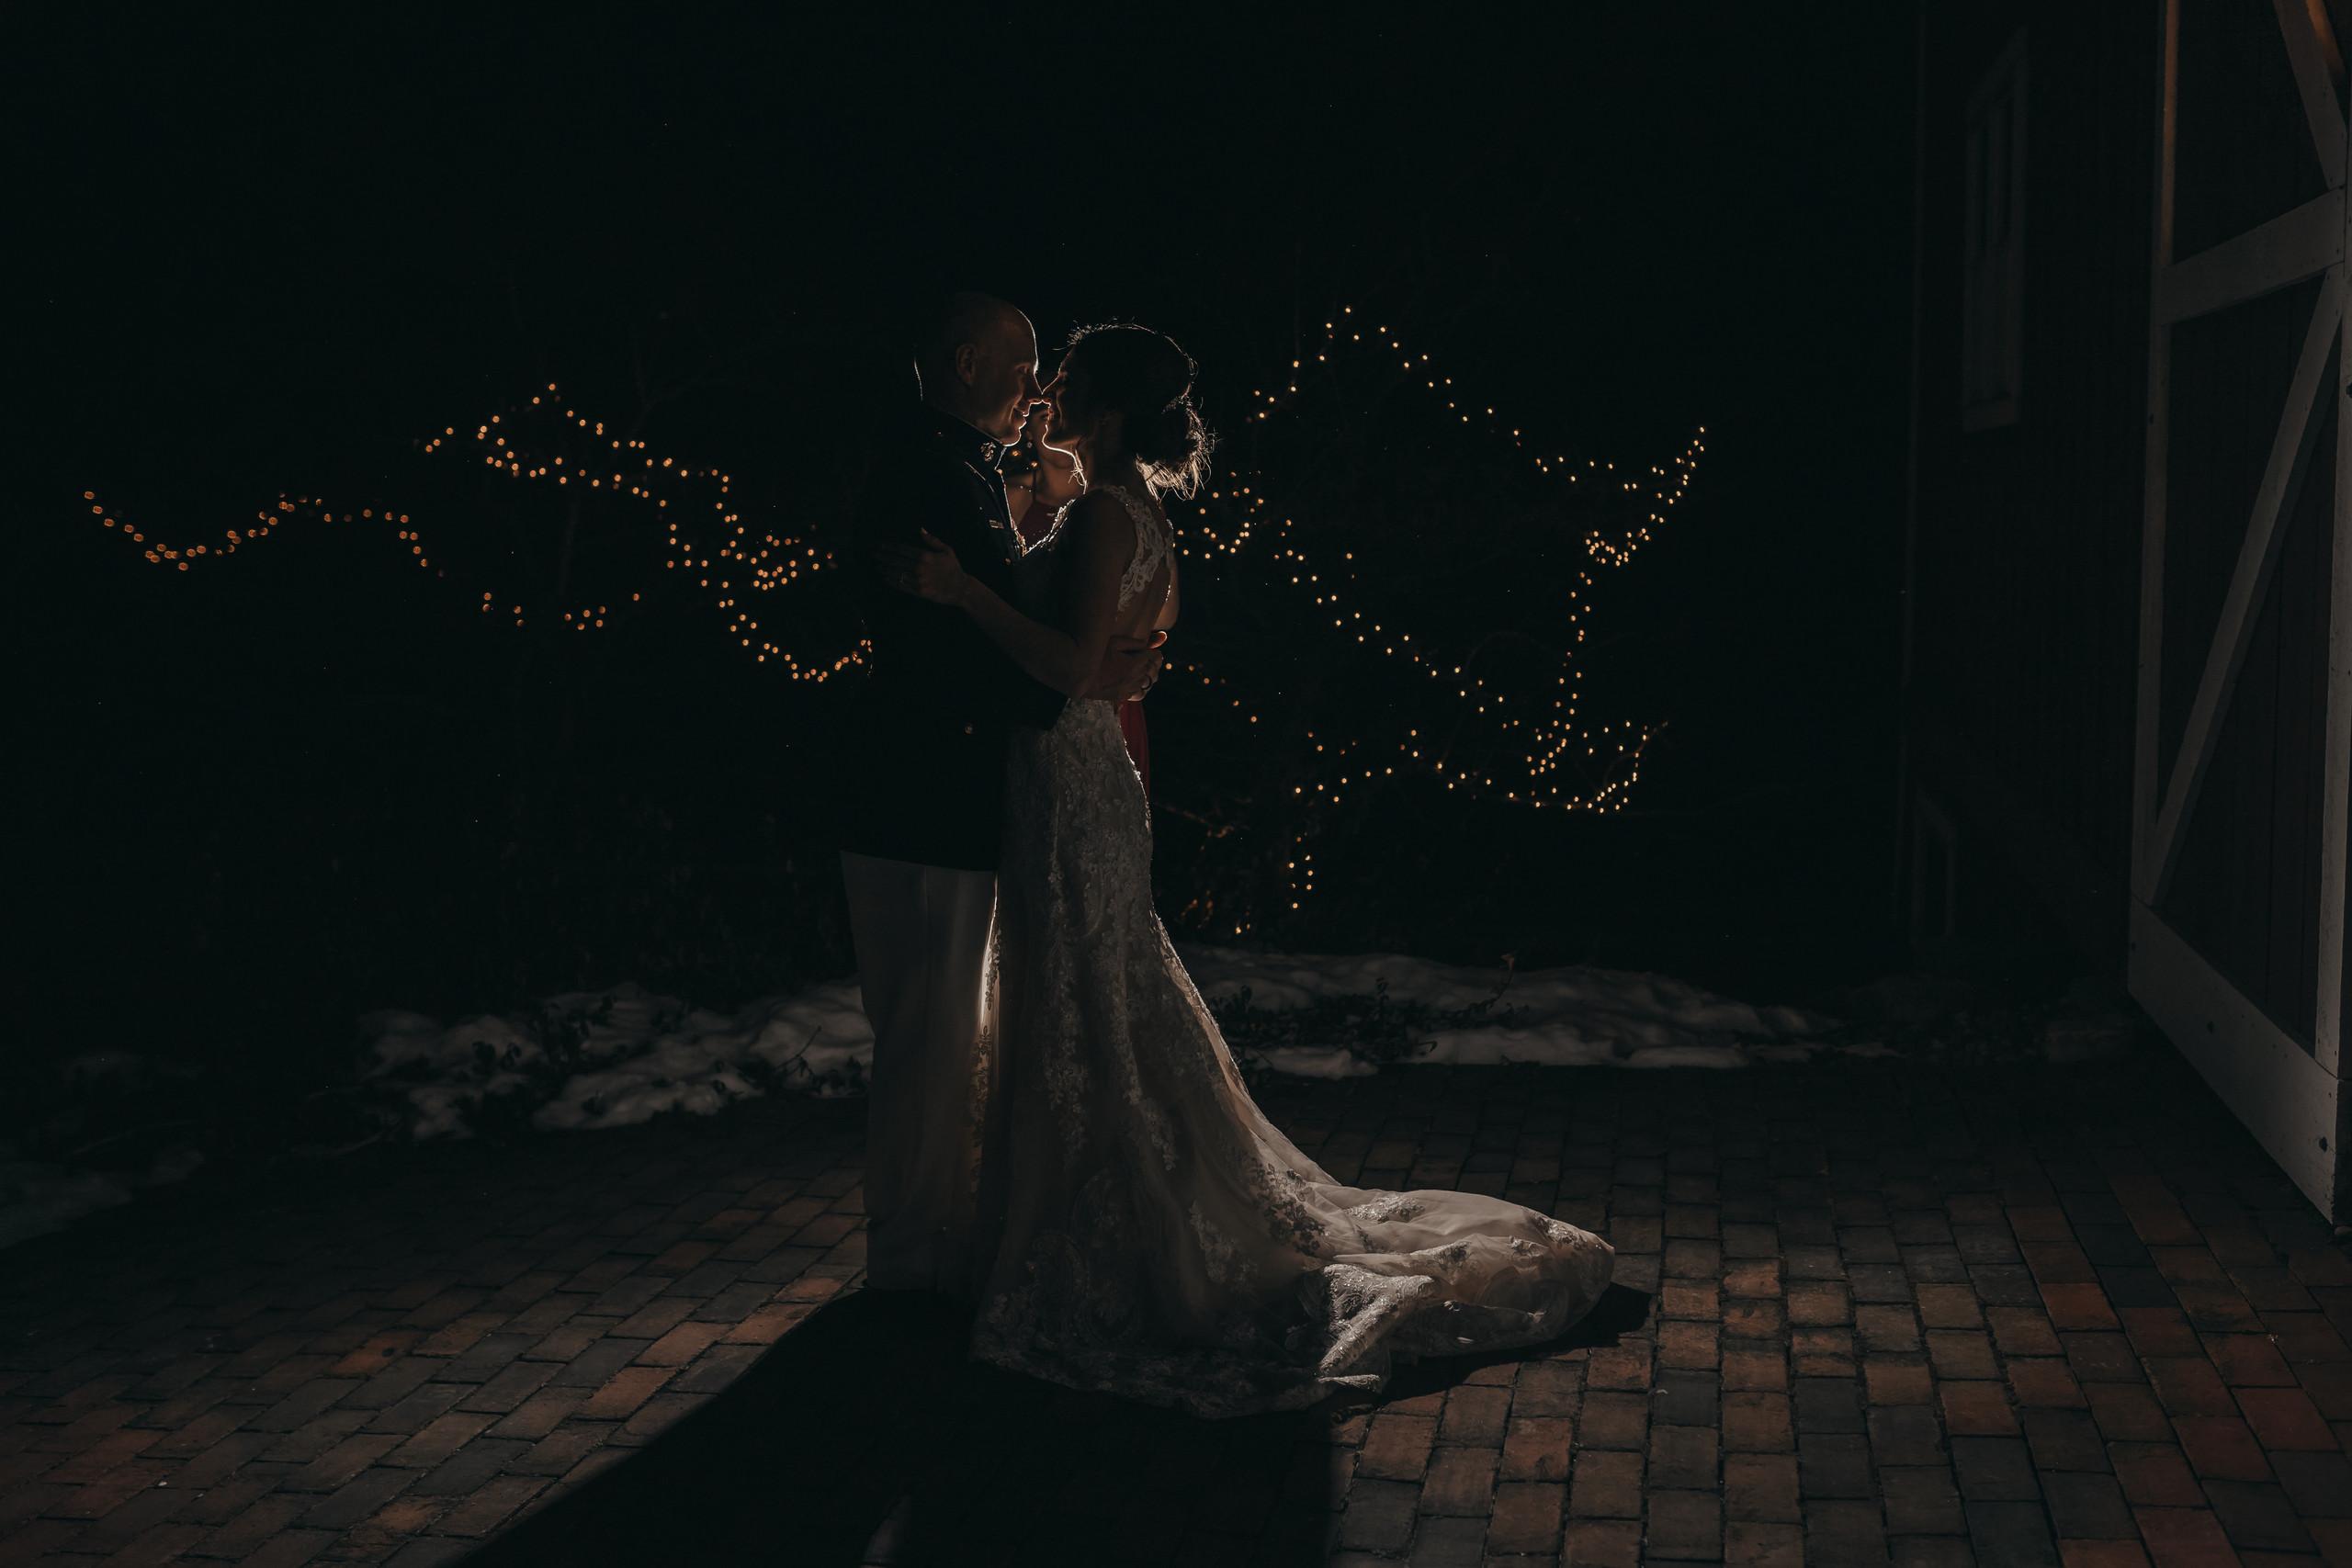 lancaster pa wedding photographer, lancaster pa engagement photographer, state college wedding photographer, lancaster pa barn wedding venue, general potter farm wedding photographer, philadelphia wedding photographer